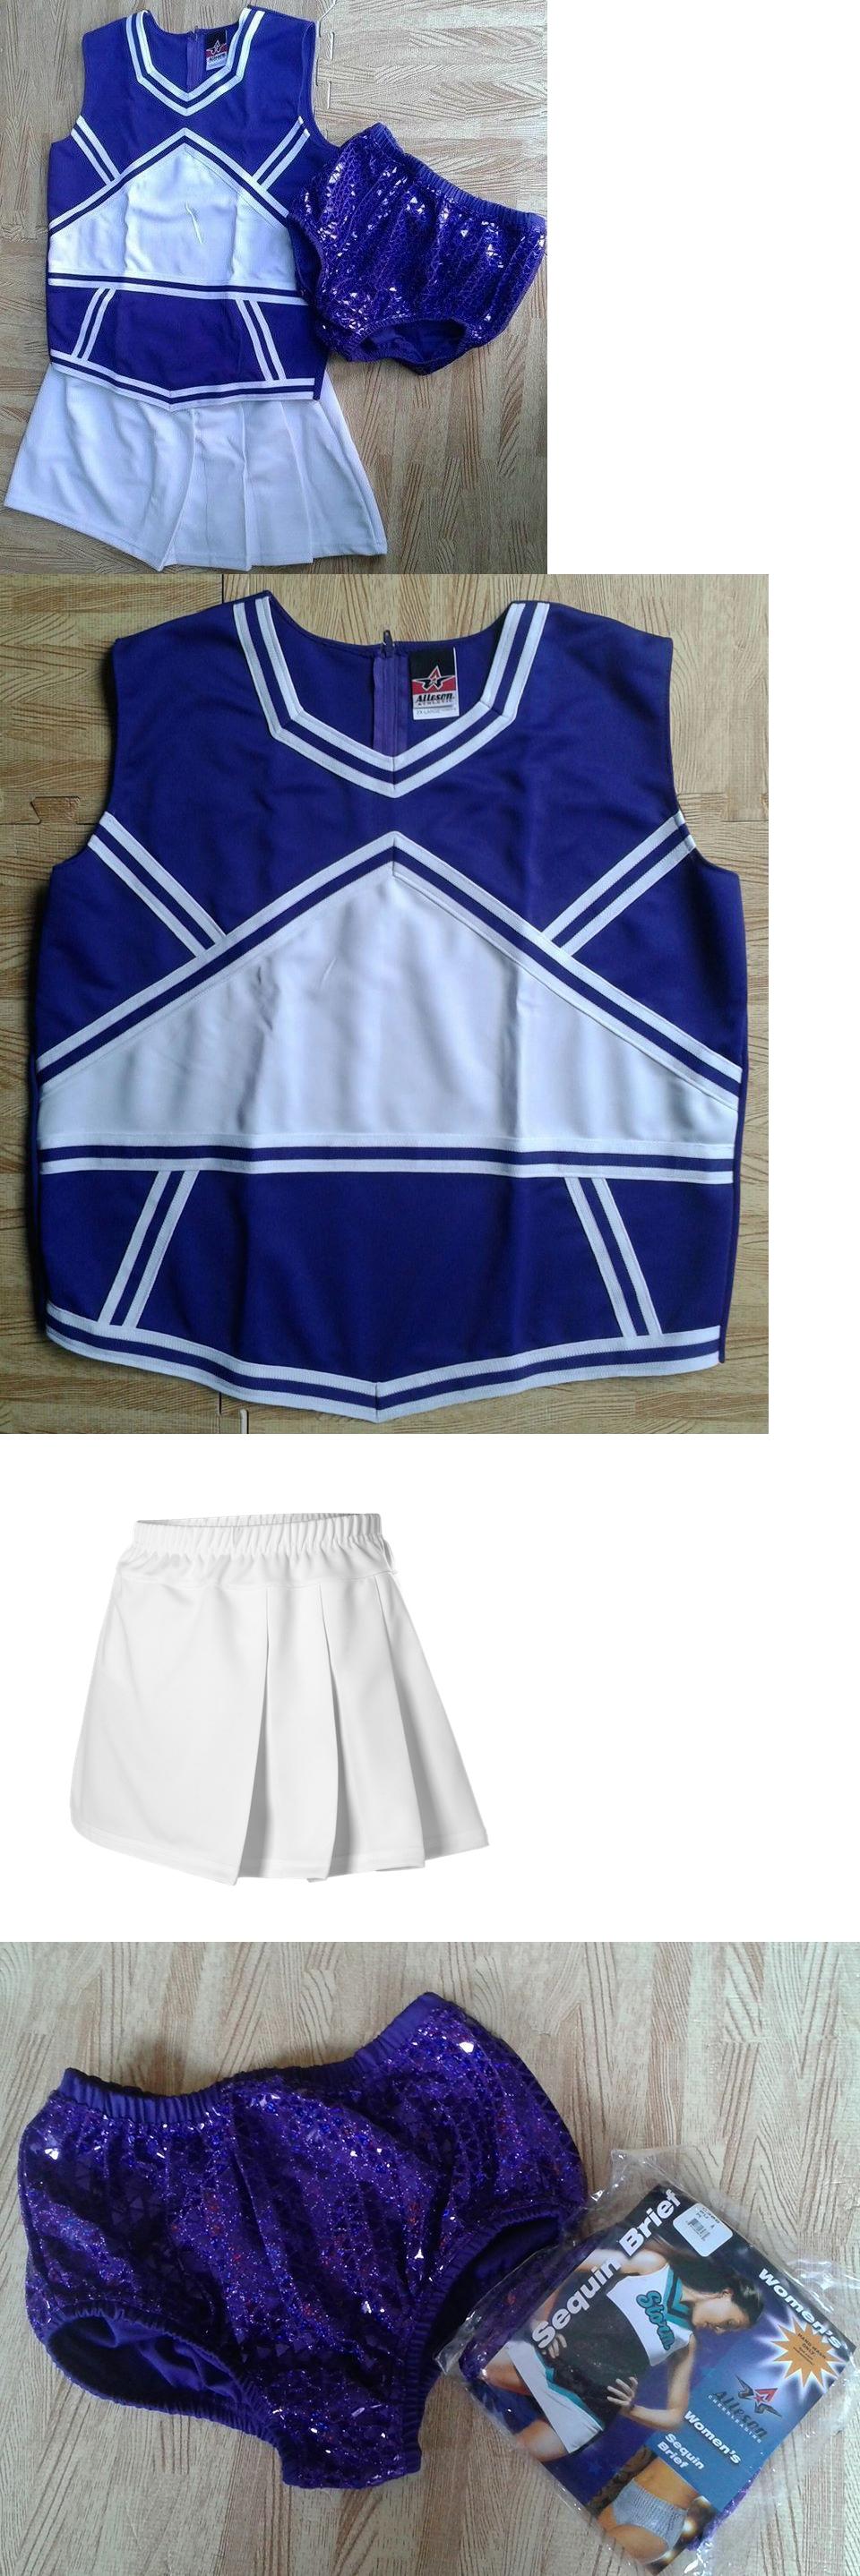 488c98f7a56 Cheerleading 66832  Fun! Purple Adult L 12 14 Real Cheerleader Uniform Top  Skirt Sequin